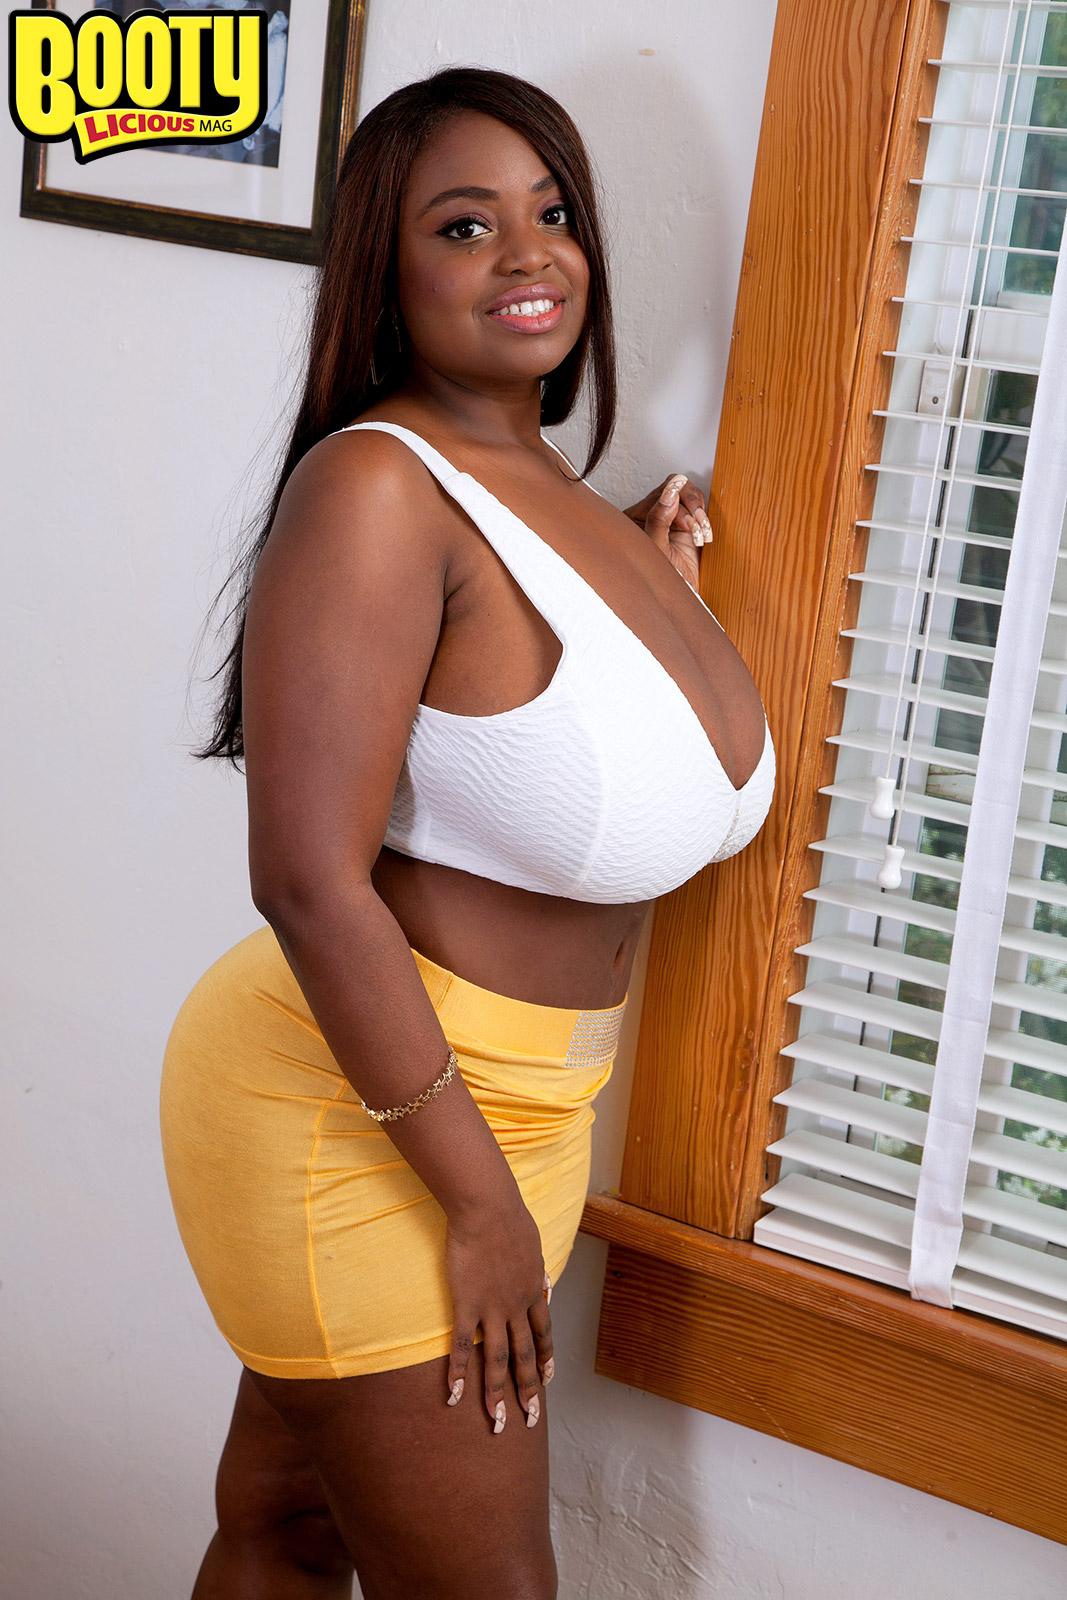 Olivia Jackson - Jacksons Fine - Bootylicious Mag 103024-1390